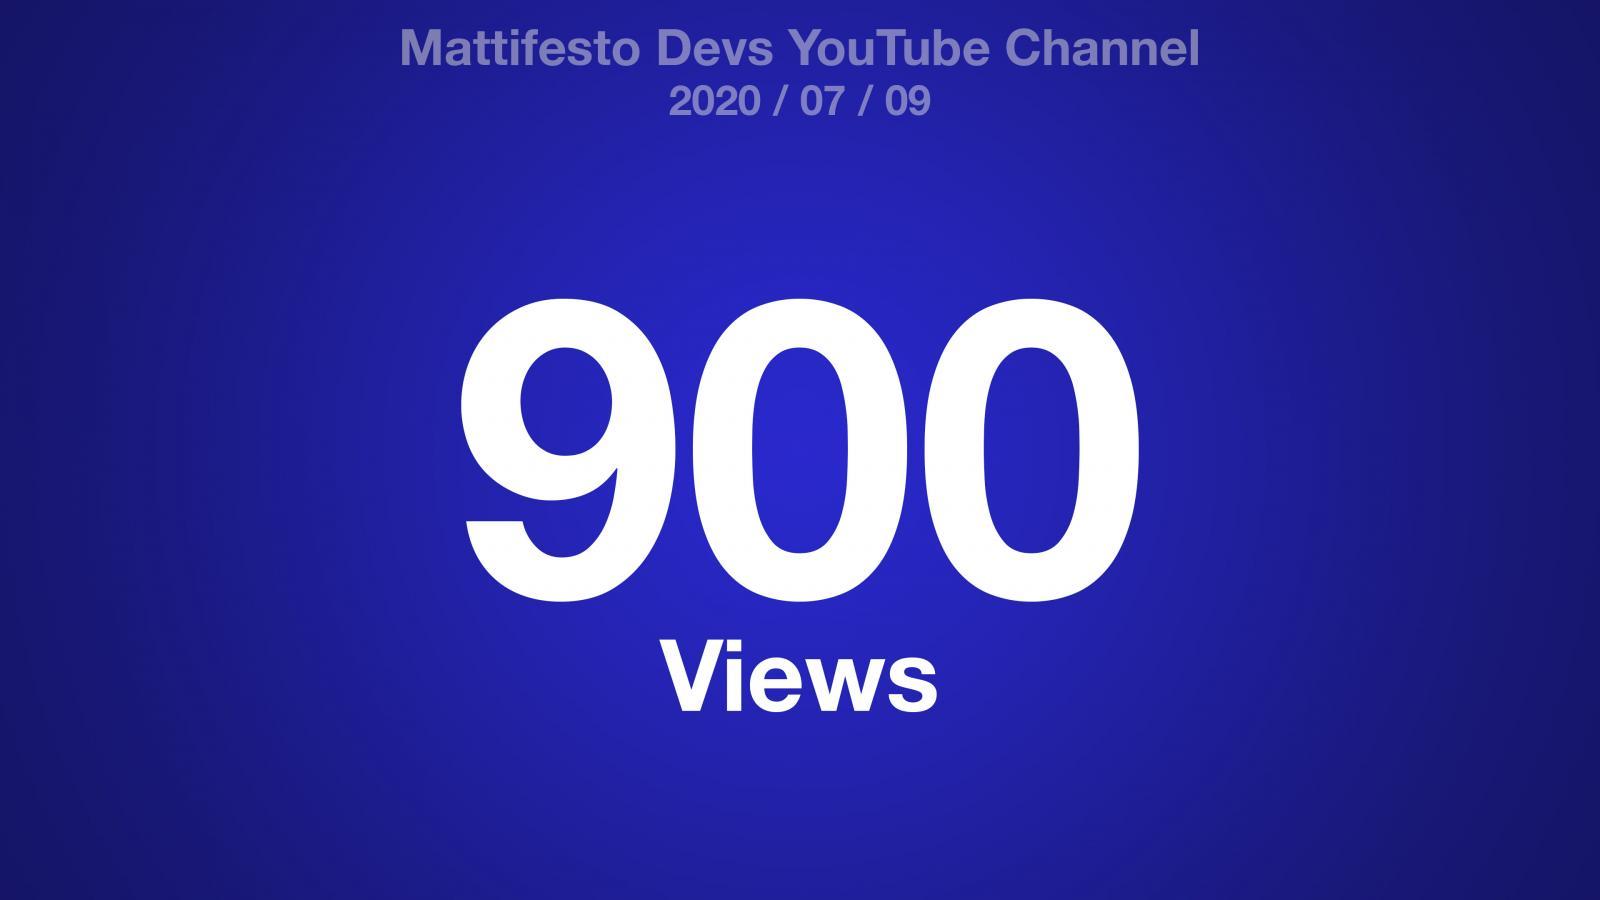 Blue gradient with the text: Mattifesto Devs YouTube Channel 2020/07/09 900 Views